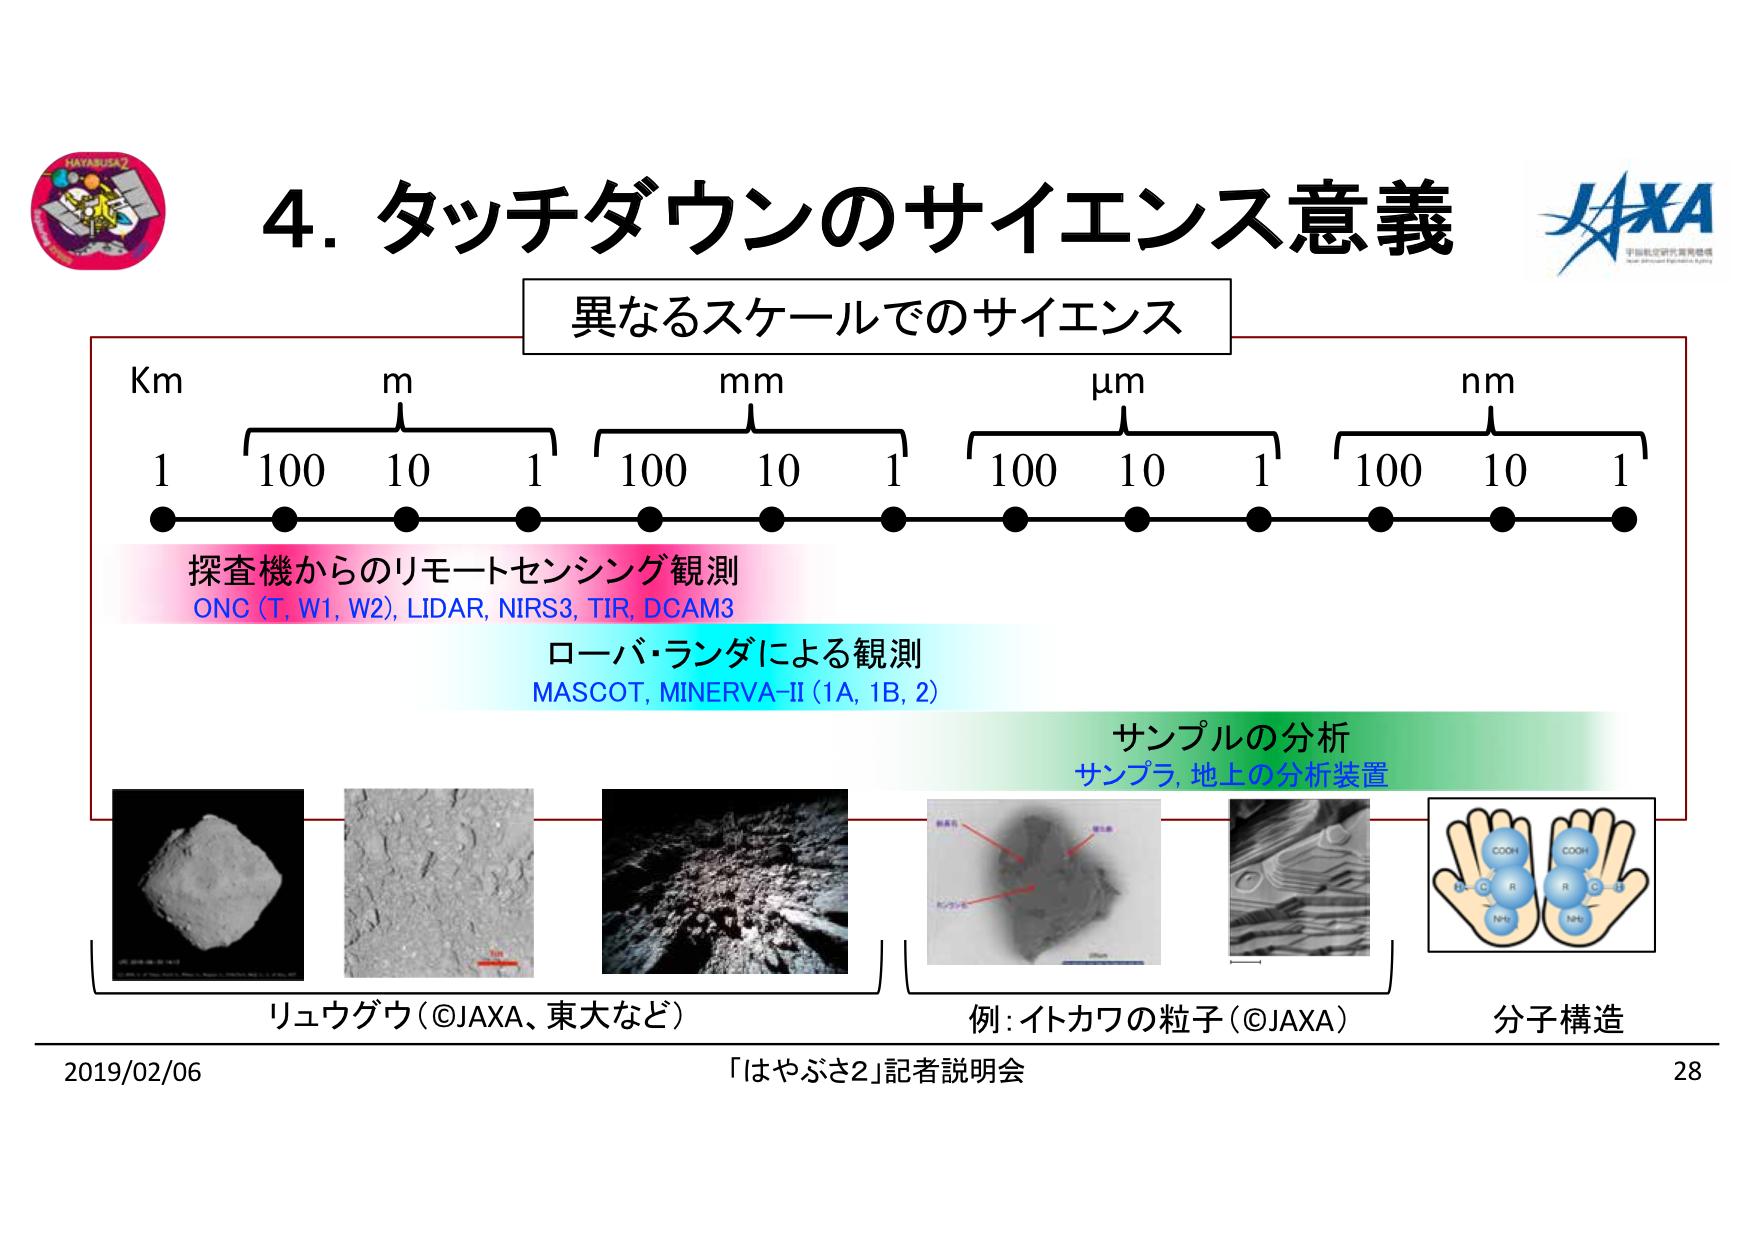 f:id:Imamura:20190204175522p:plain